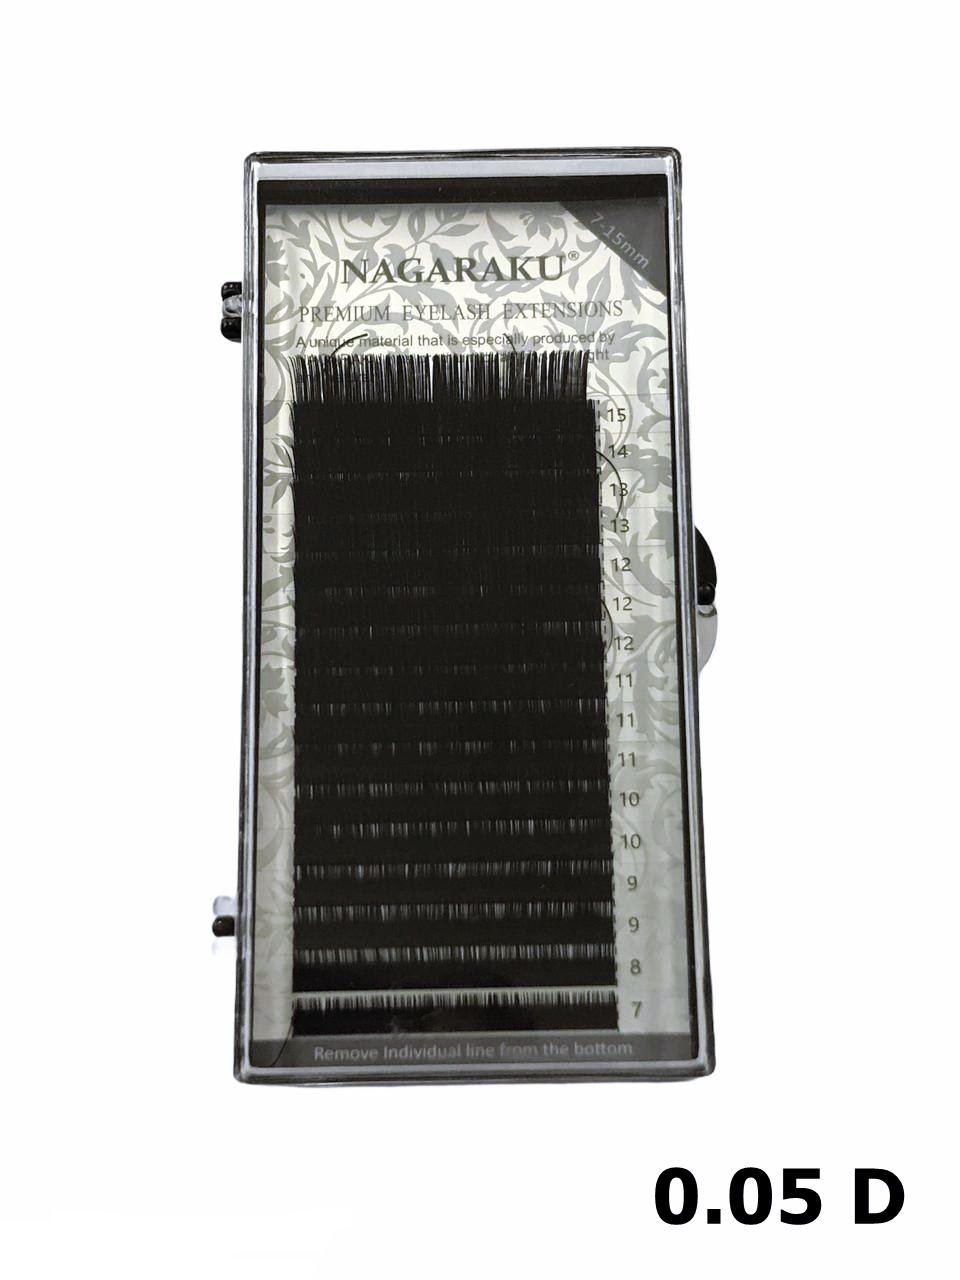 Cílios Nagaraku Premium Mink Mix 7-15mm Fio A Fio 0.05 D